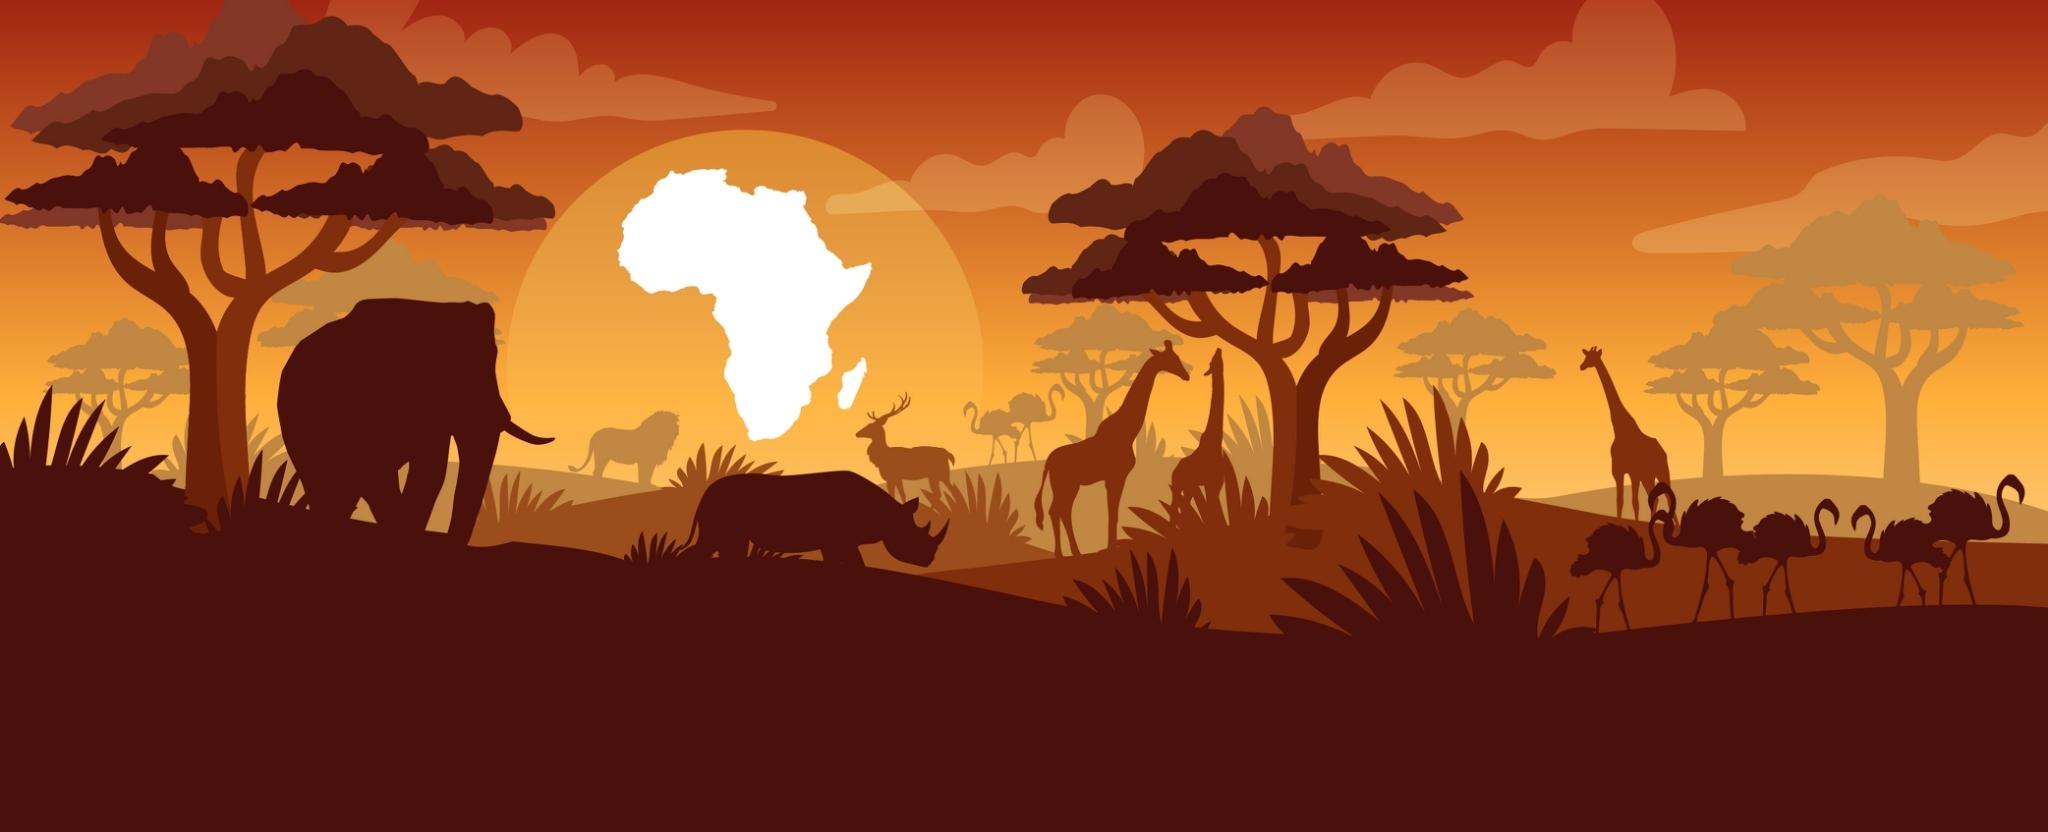 COVID-19 ในแอฟริกา .... ผลกระทบทางเศรษฐกิจอาจไม่รุนแรง แต่ควรติดตามอย่...